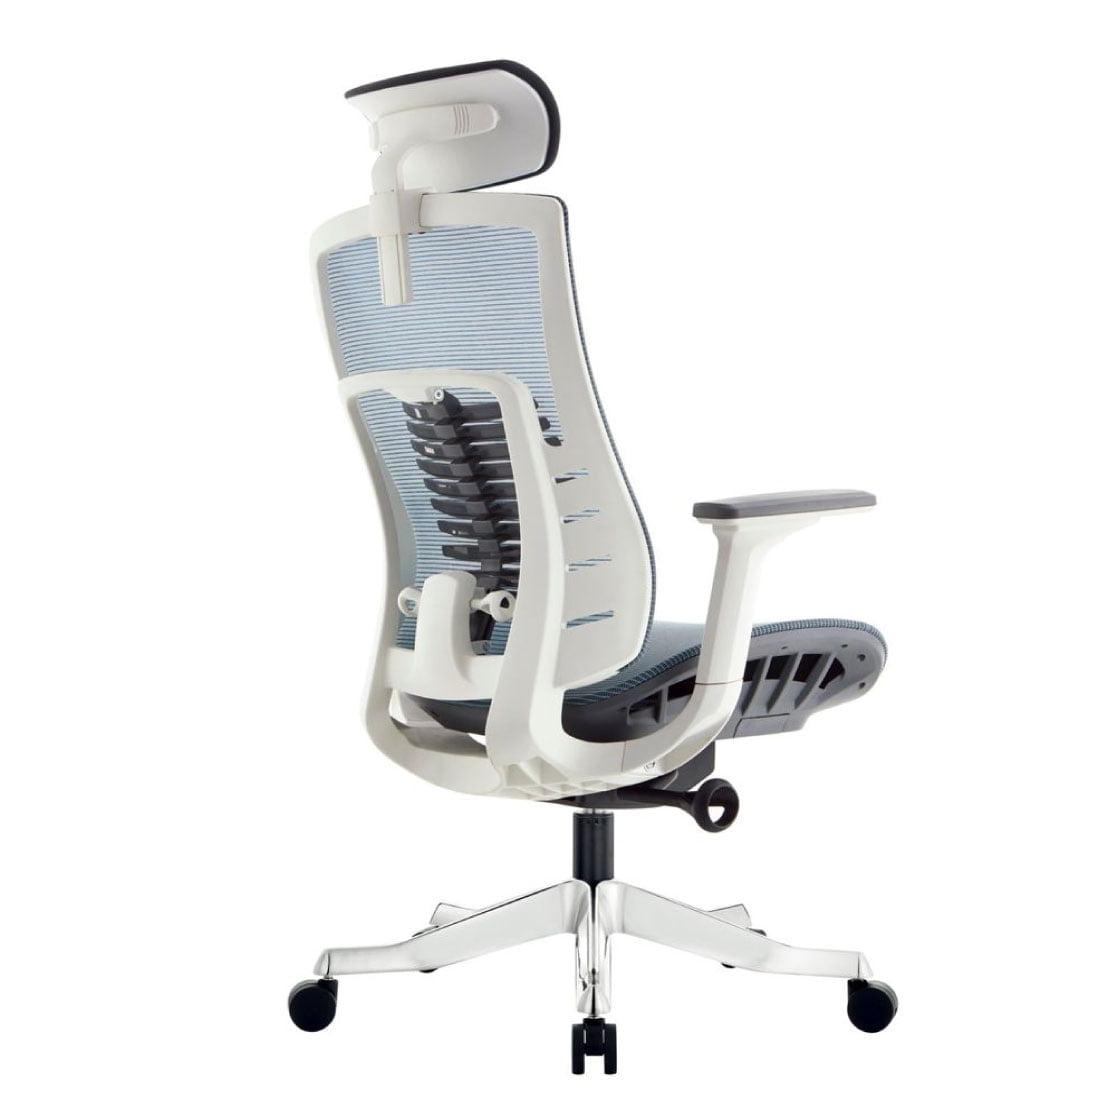 Inspire ergonomic chair